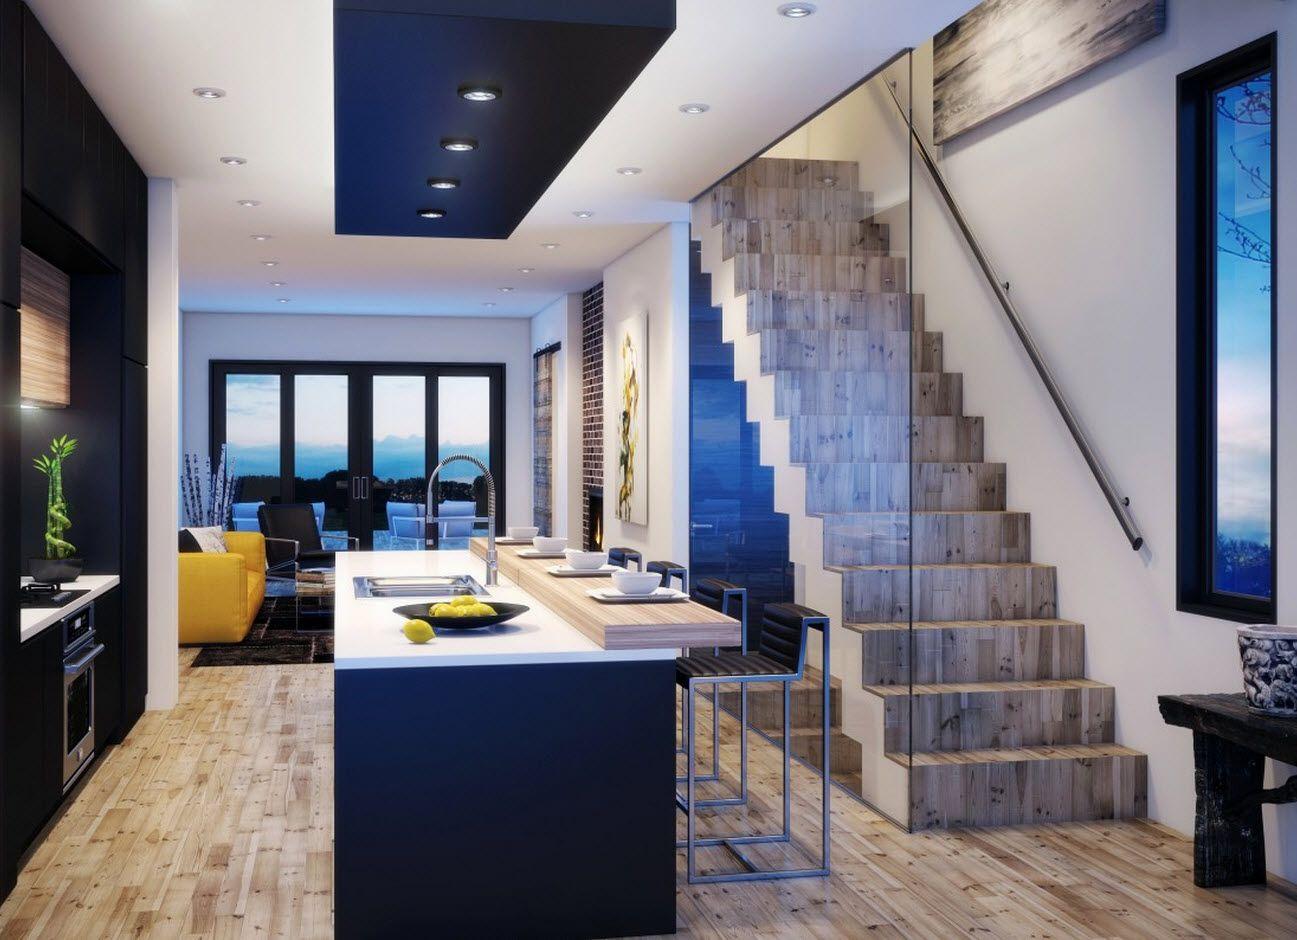 Related Keywords & Suggestions for interiores de casas ... on Interiores De Casas Modernas  id=54822